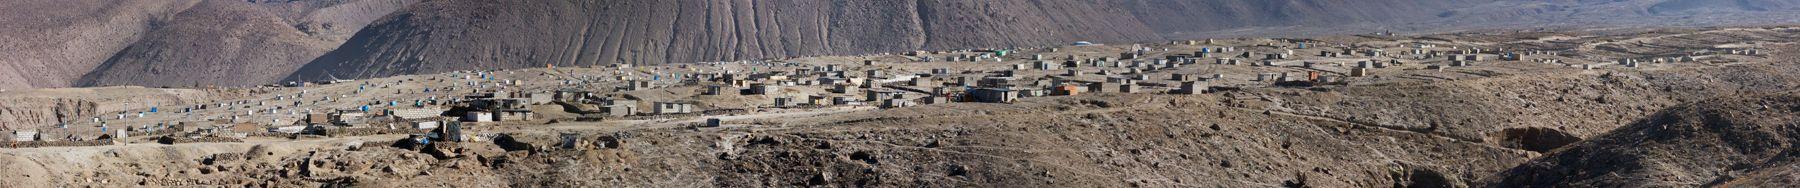 Seeing Peru: Layered Realities